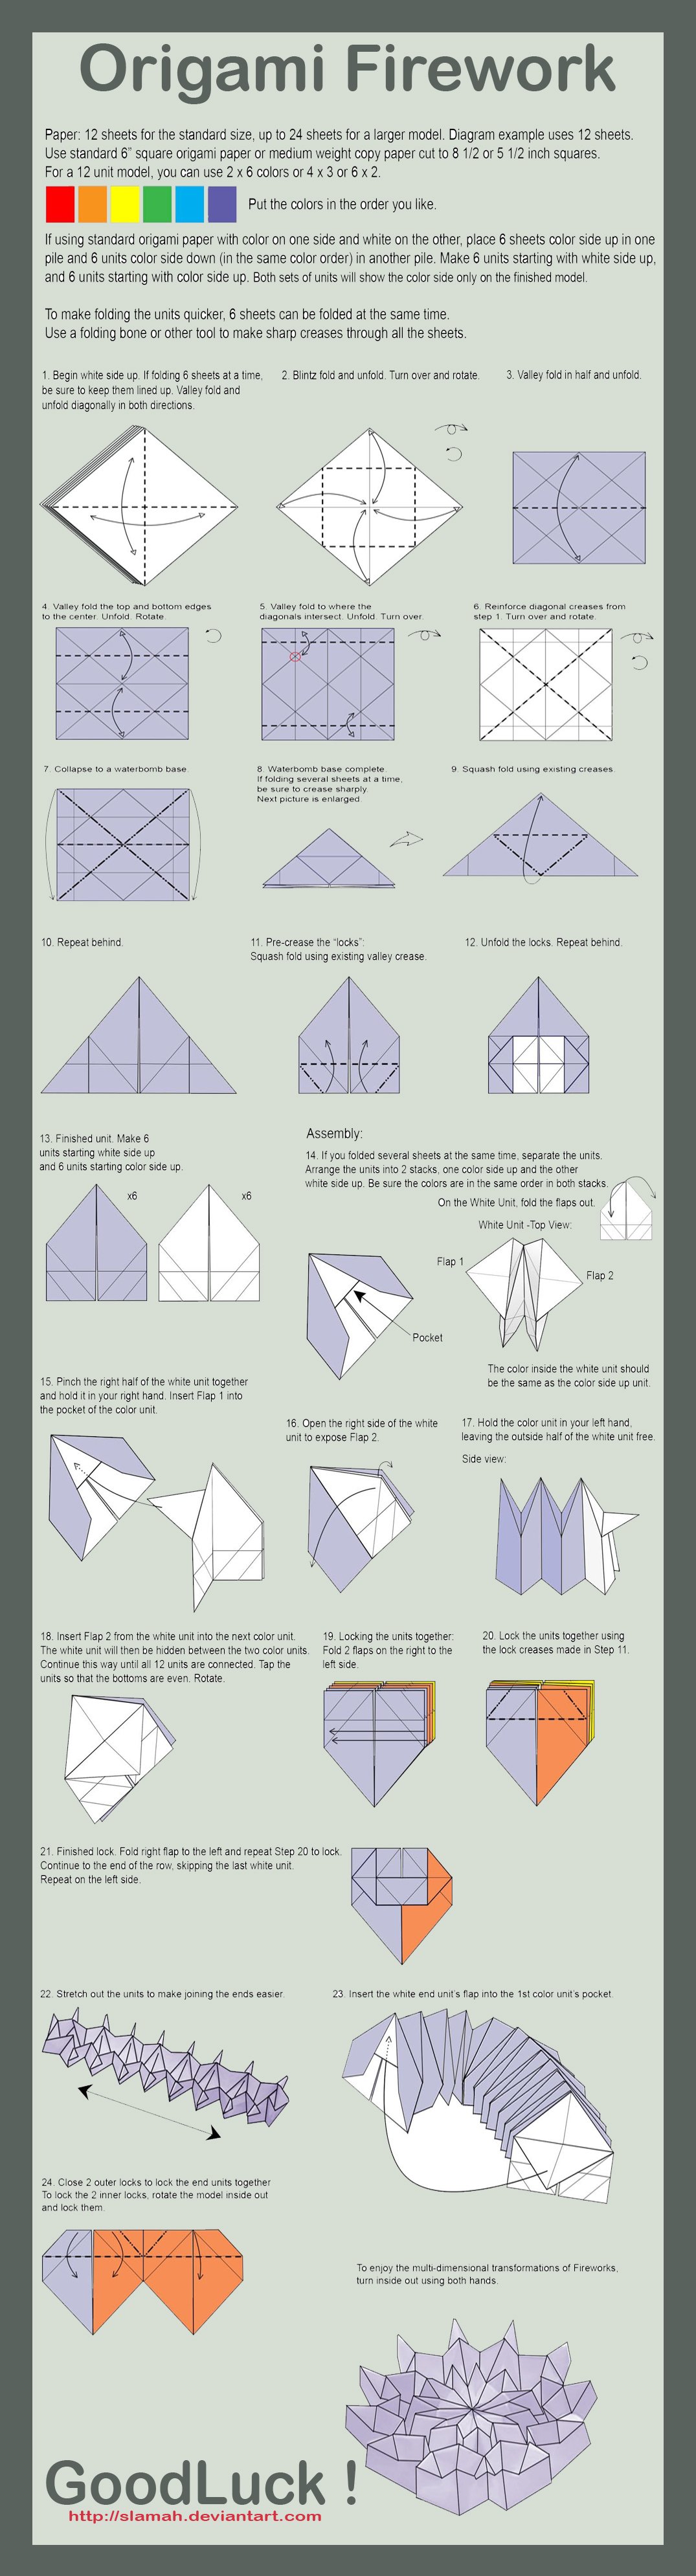 Folding Origami Box Diagram Vl Ignition Wiring Firework Instructions